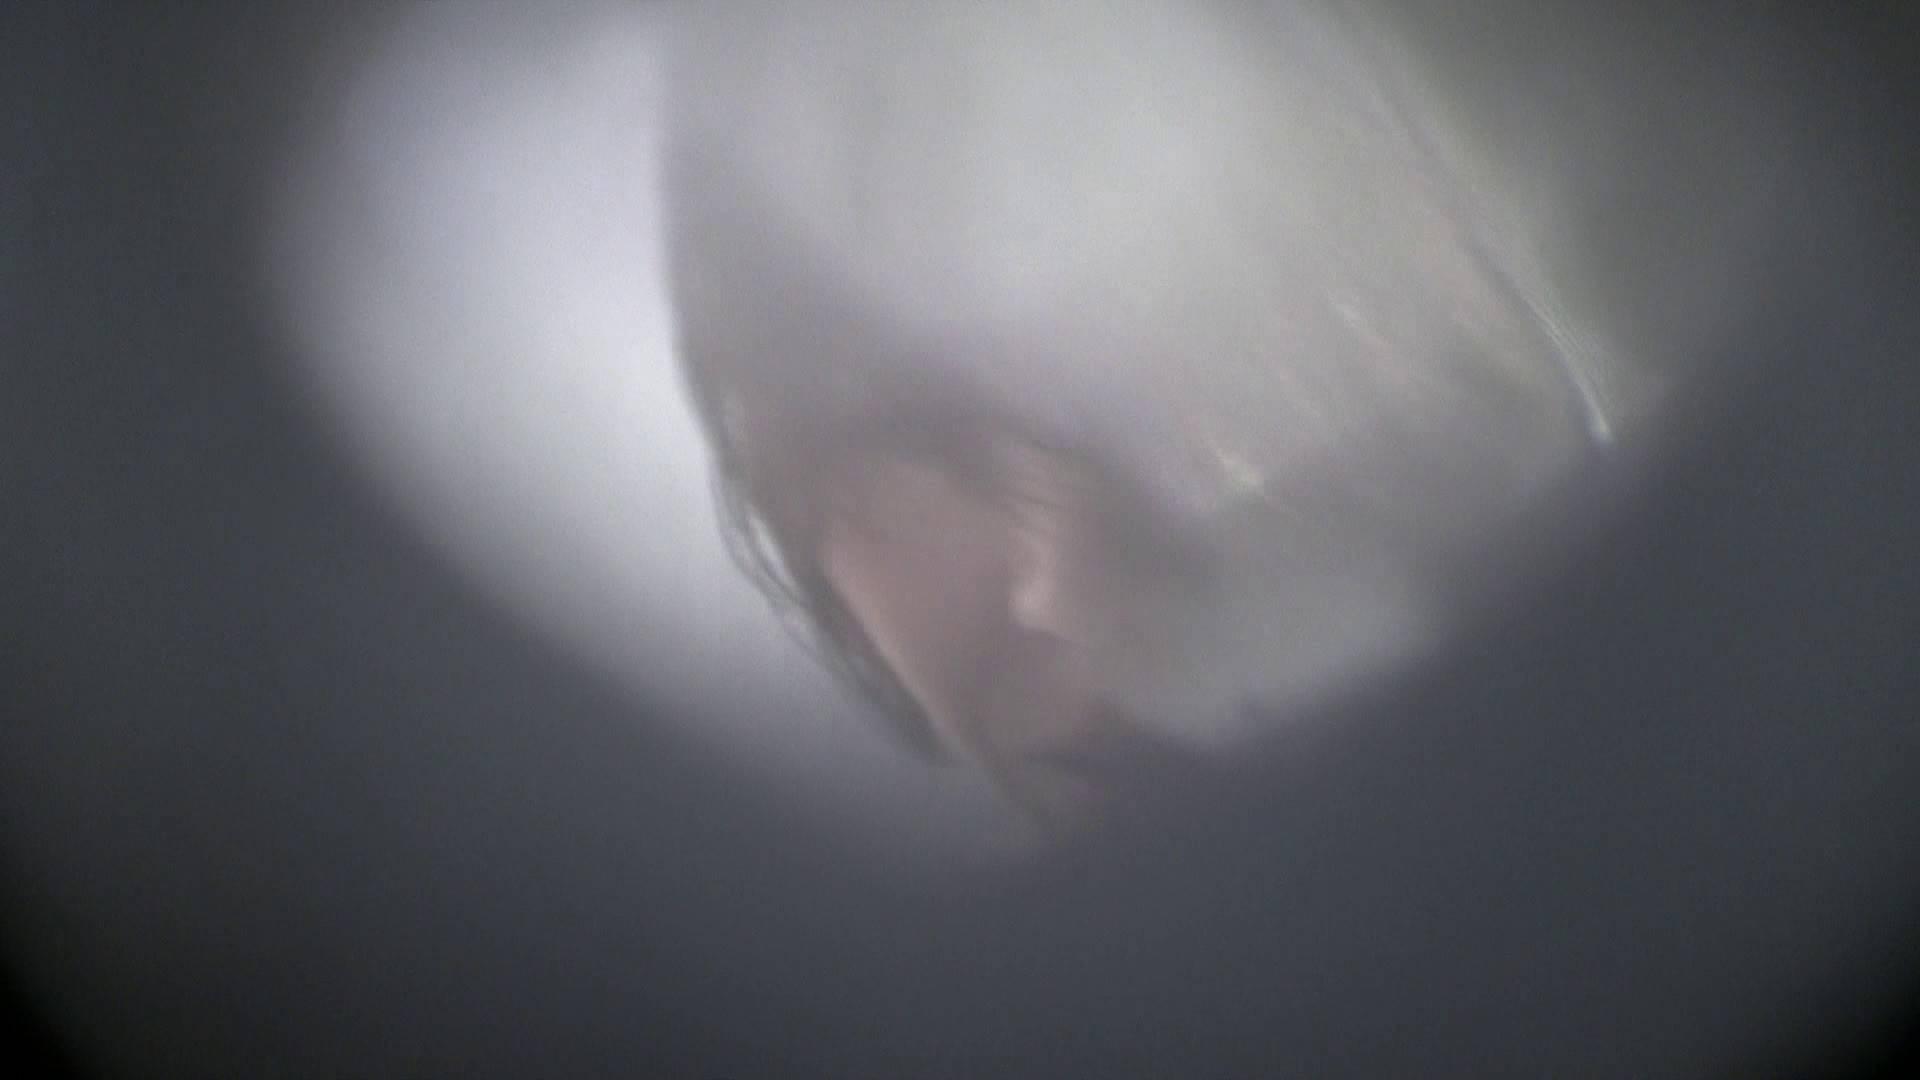 NO.11 年増の一本道!!中身ハミ出てます シャワー室 おめこ無修正動画無料 97画像 18